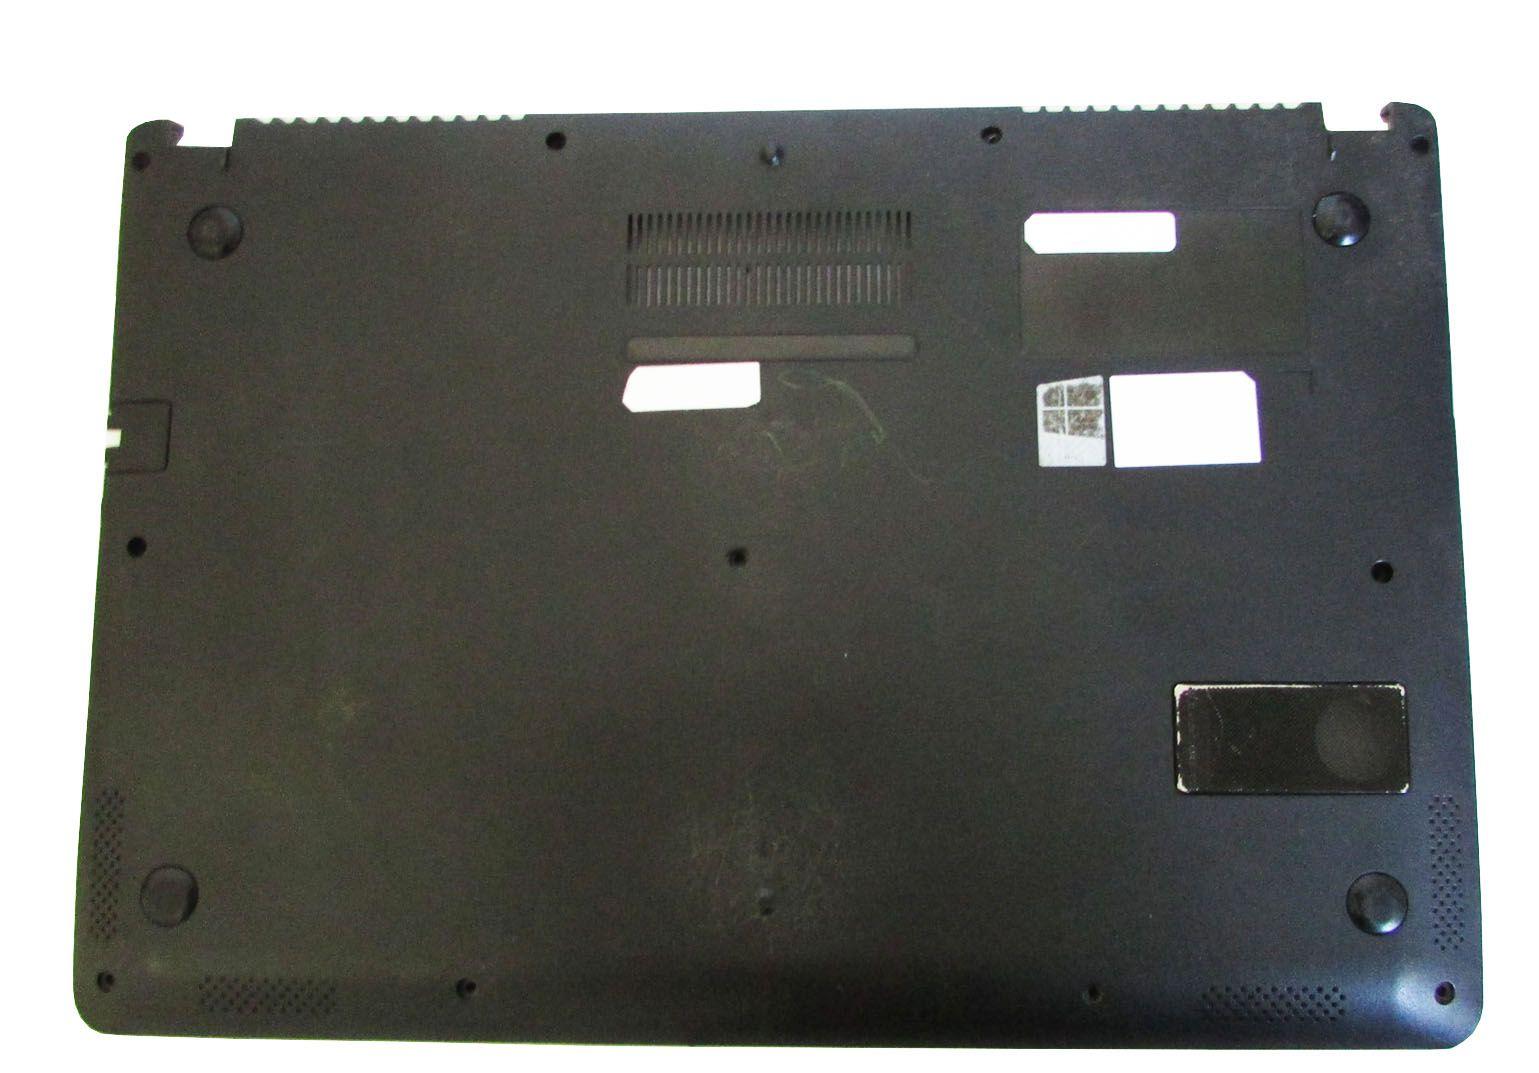 Carcaça Base Notebook Dell 5470 P/N: 36jw8ba0010 (semi novo)